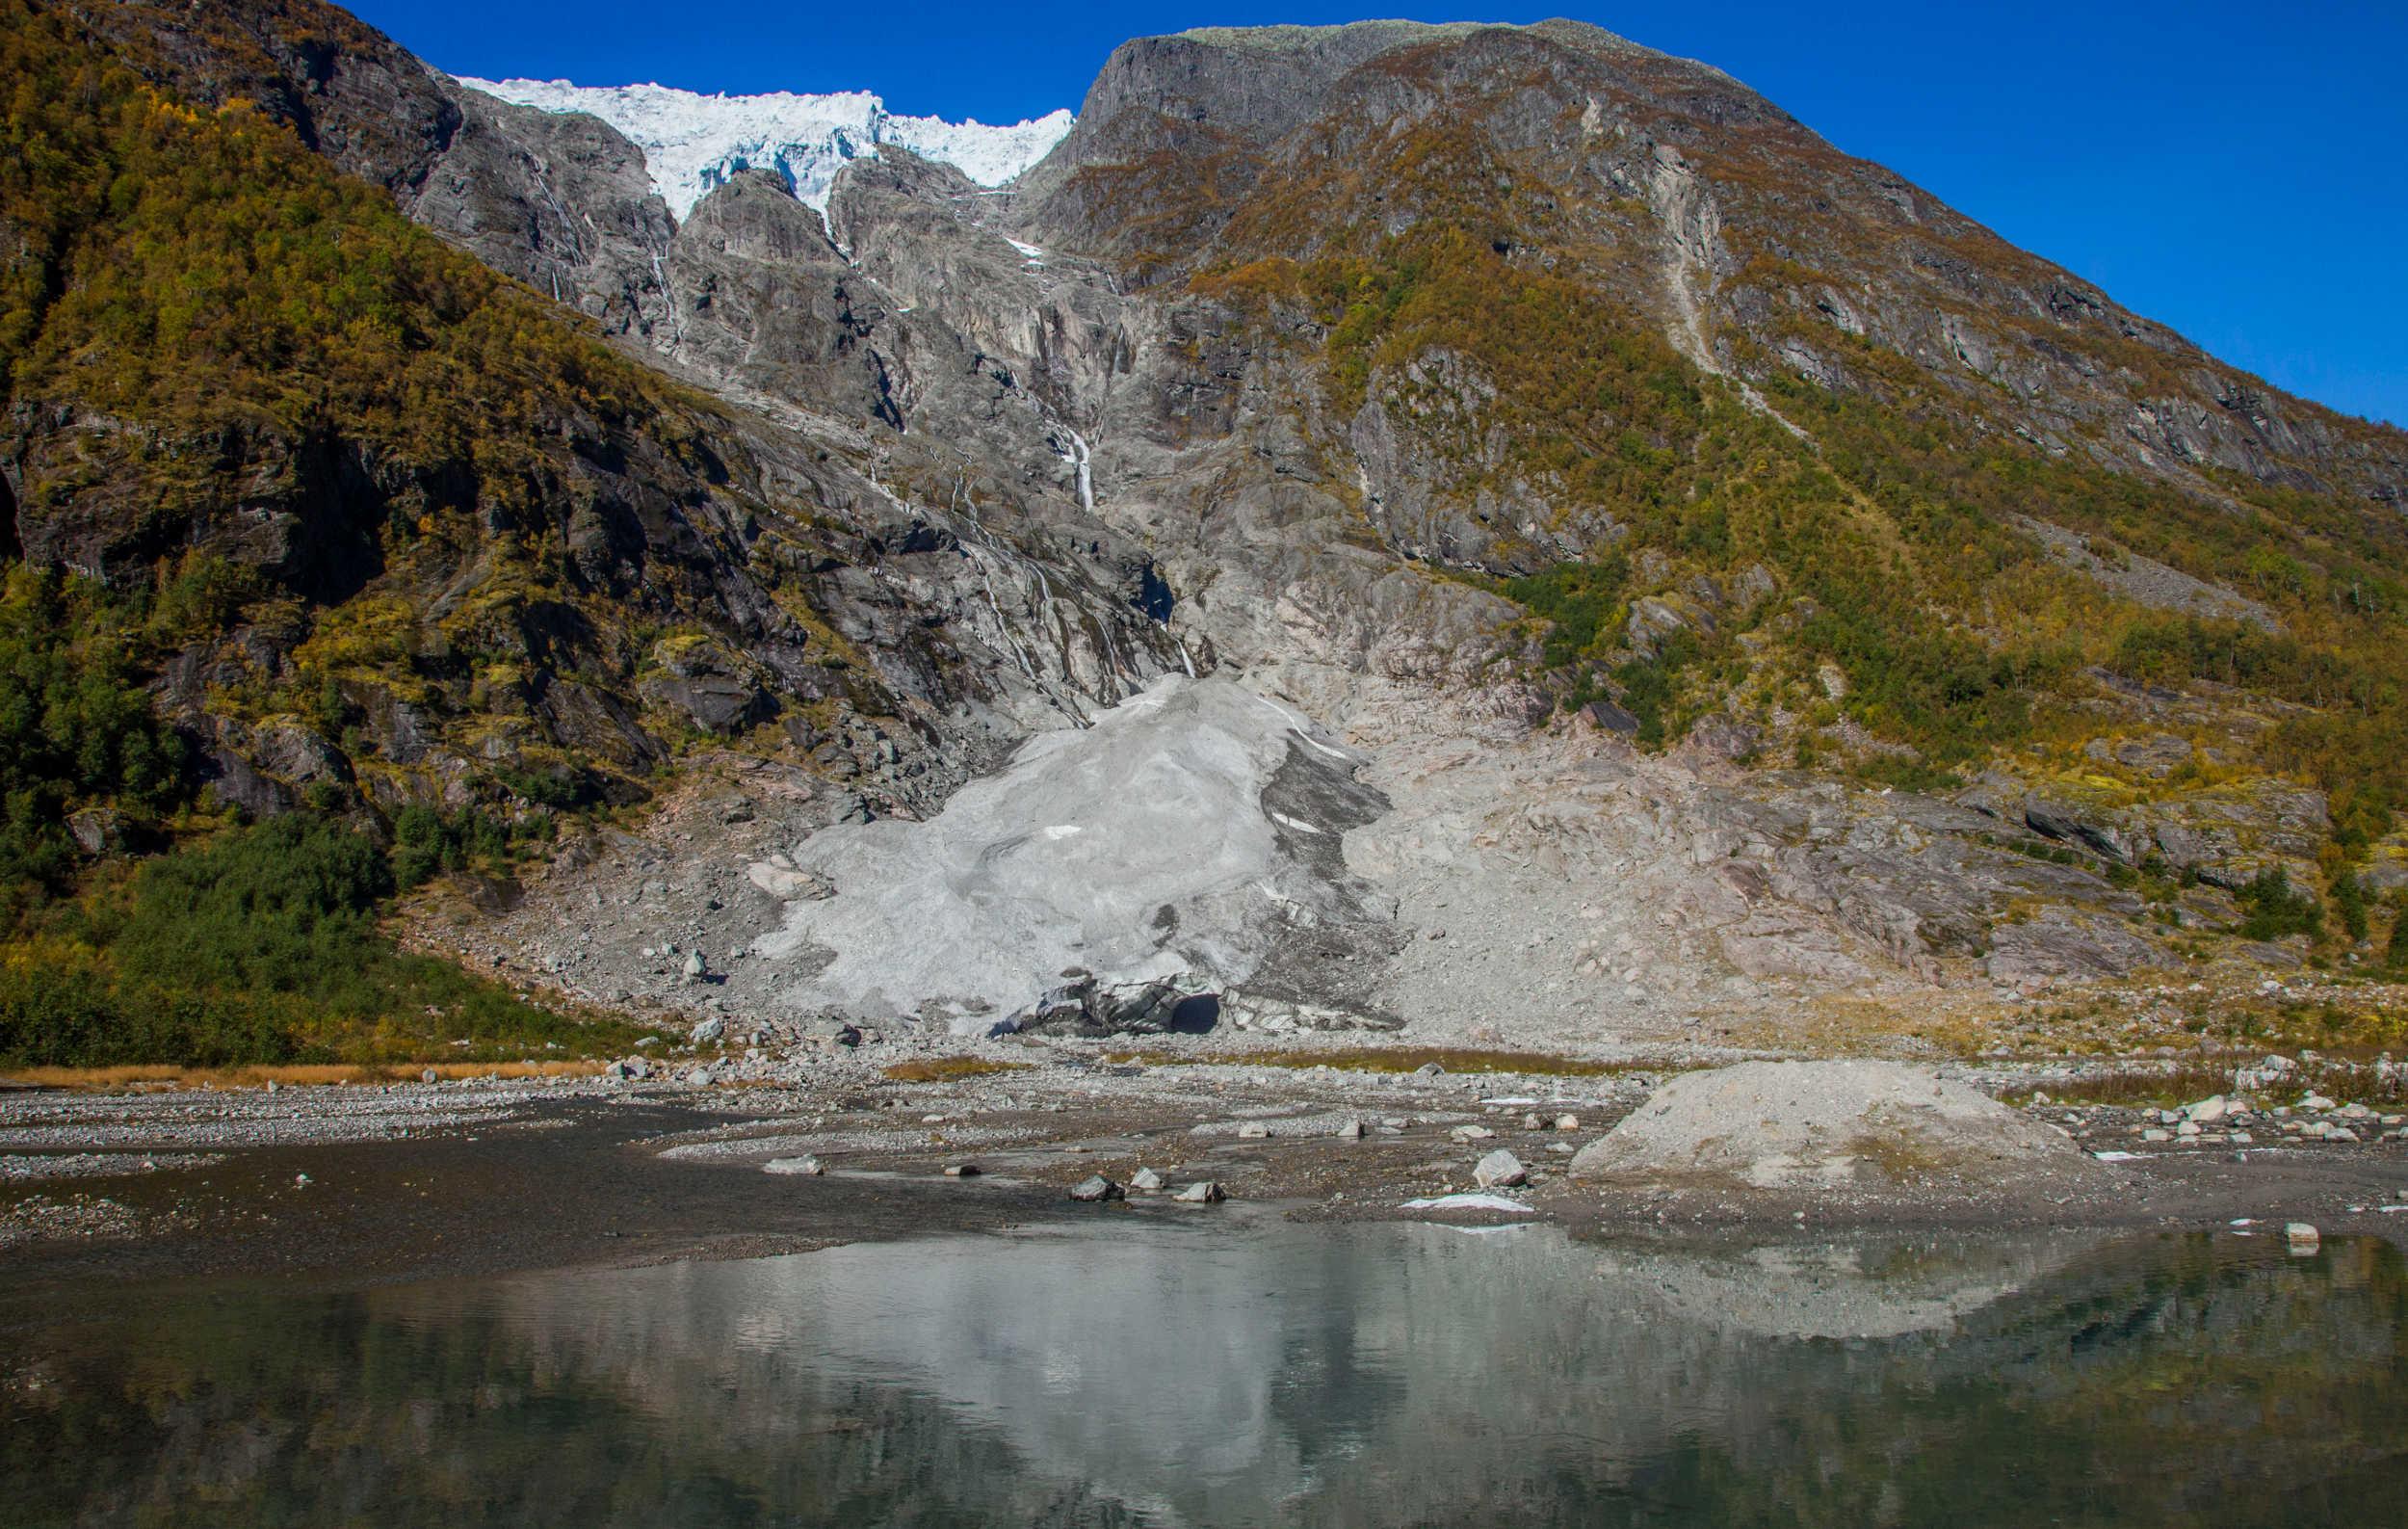 Supphellebreen Glacier 2013